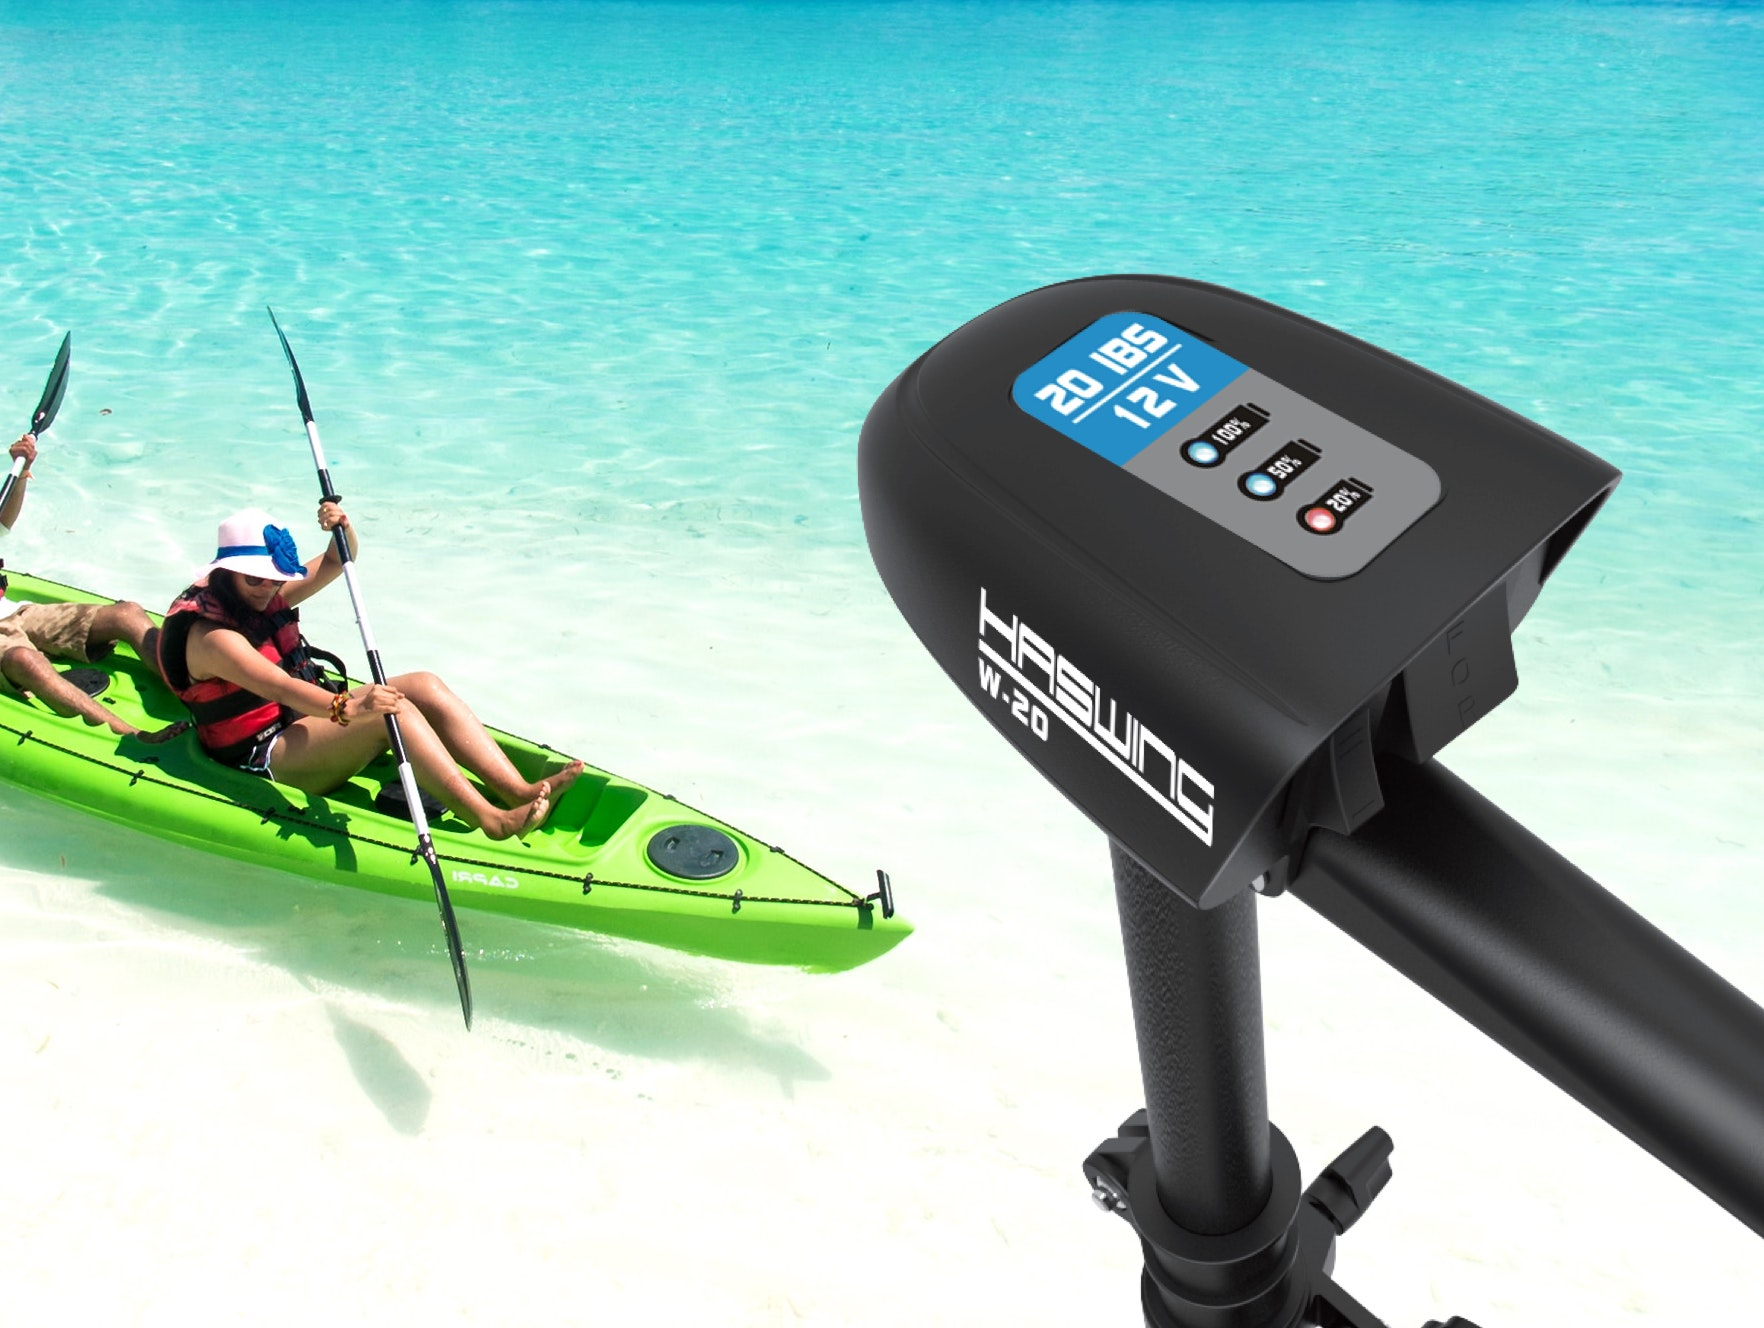 W20 Kayak Pro